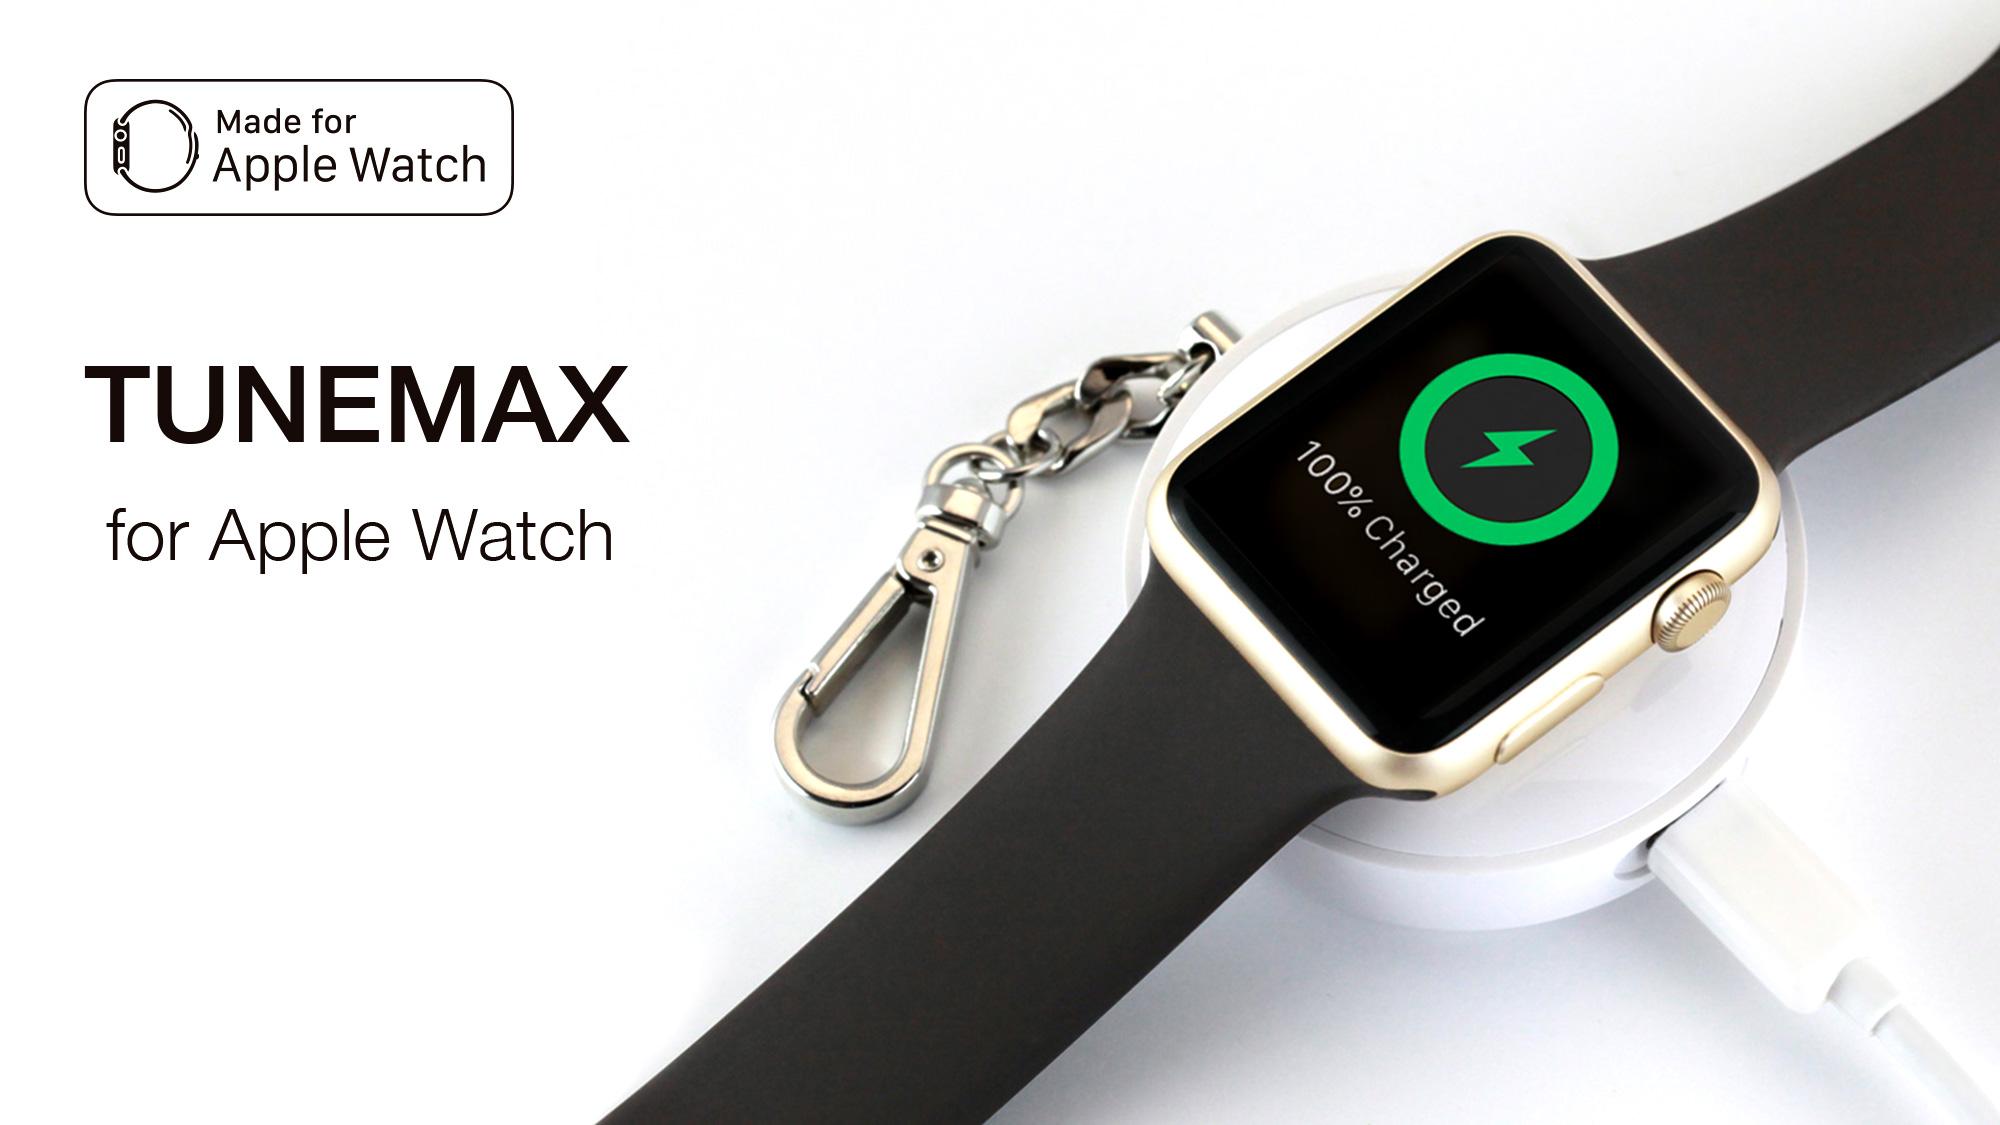 TUNEWEAR – Apple Watch 배터리팩 TUNEMAX 발표